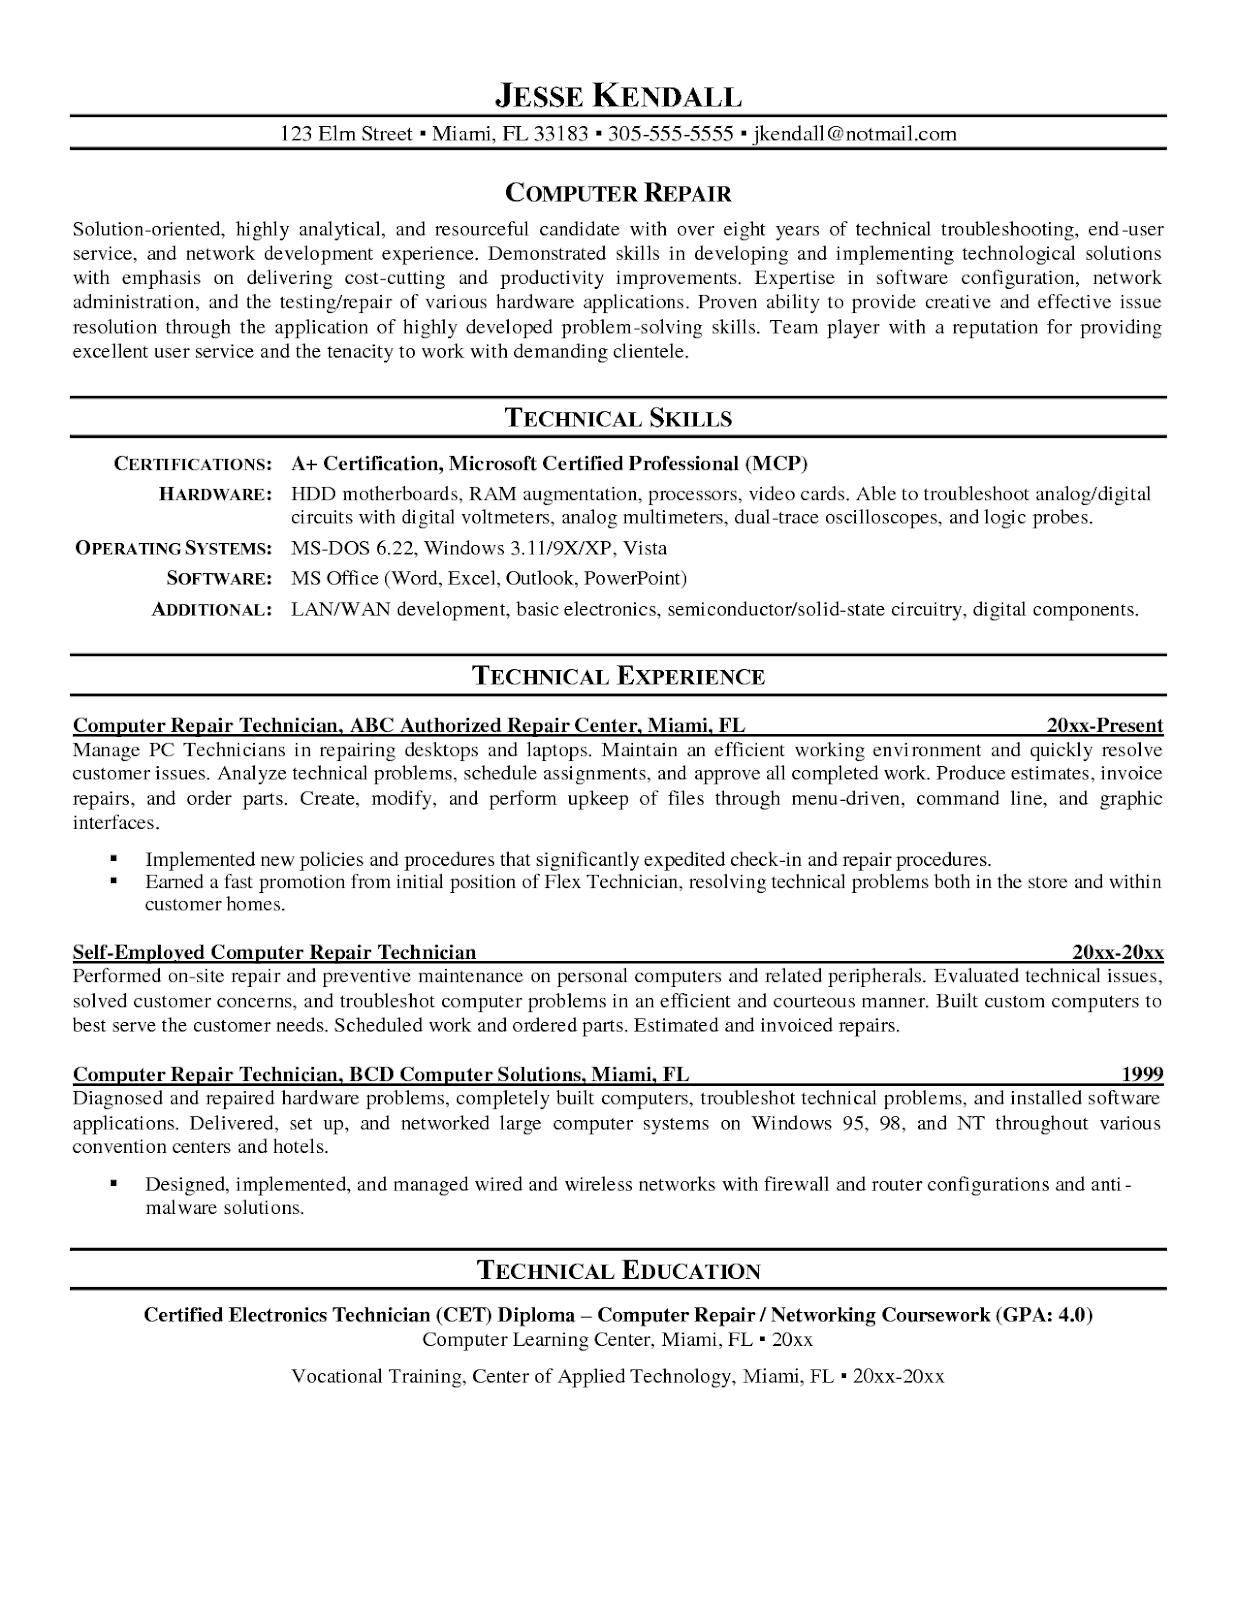 Audio Visual Technician Resume Audio Visual Technician Resume Pdf Audio Visual Technician Resume Sampl Job Resume Samples Cover Letter For Resume Sample Resume